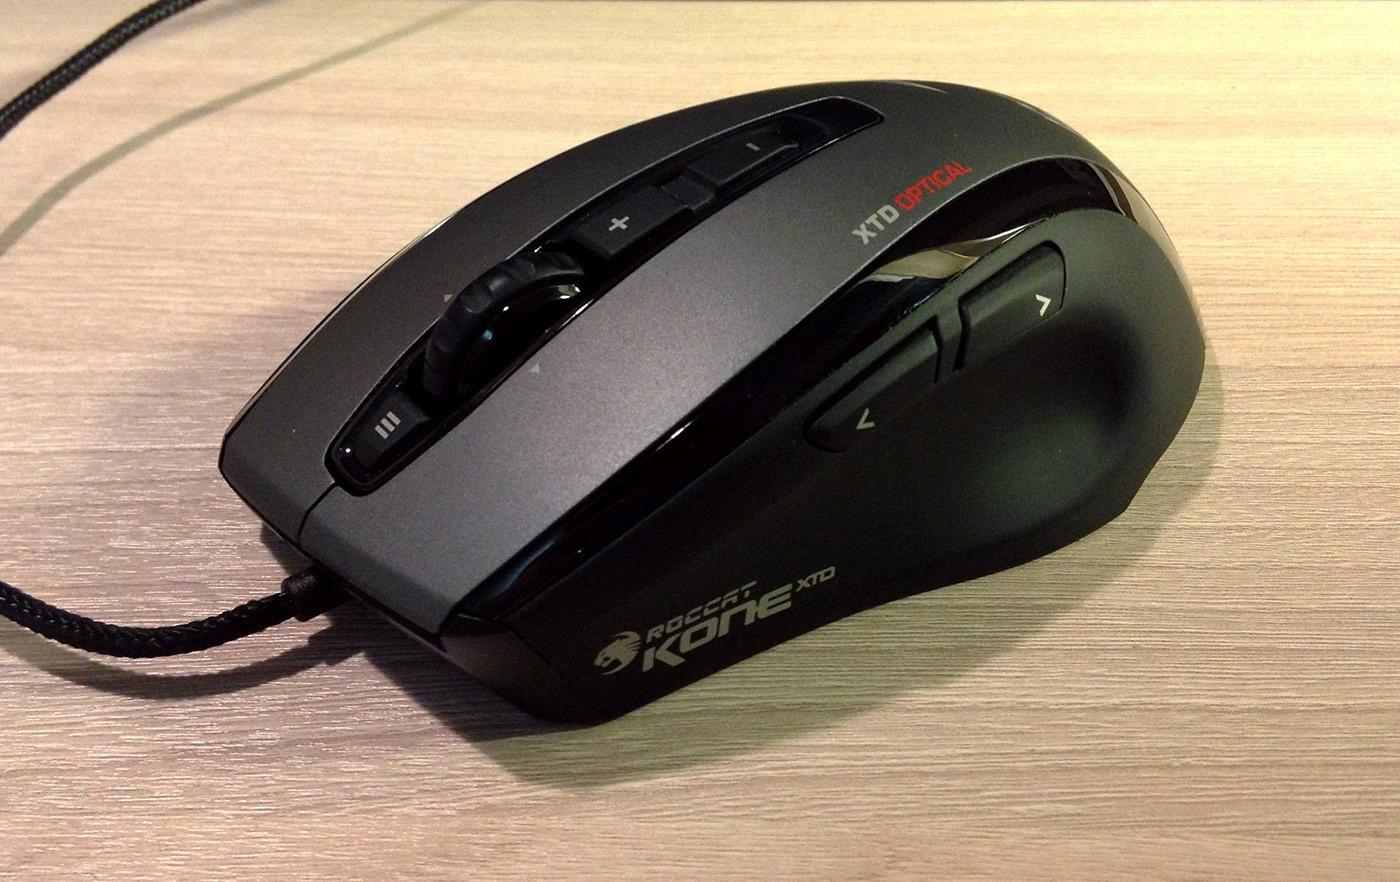 Мышки топ-сегмента – Roccat Kone XTD и Roccat Kone XTD Optical - 9